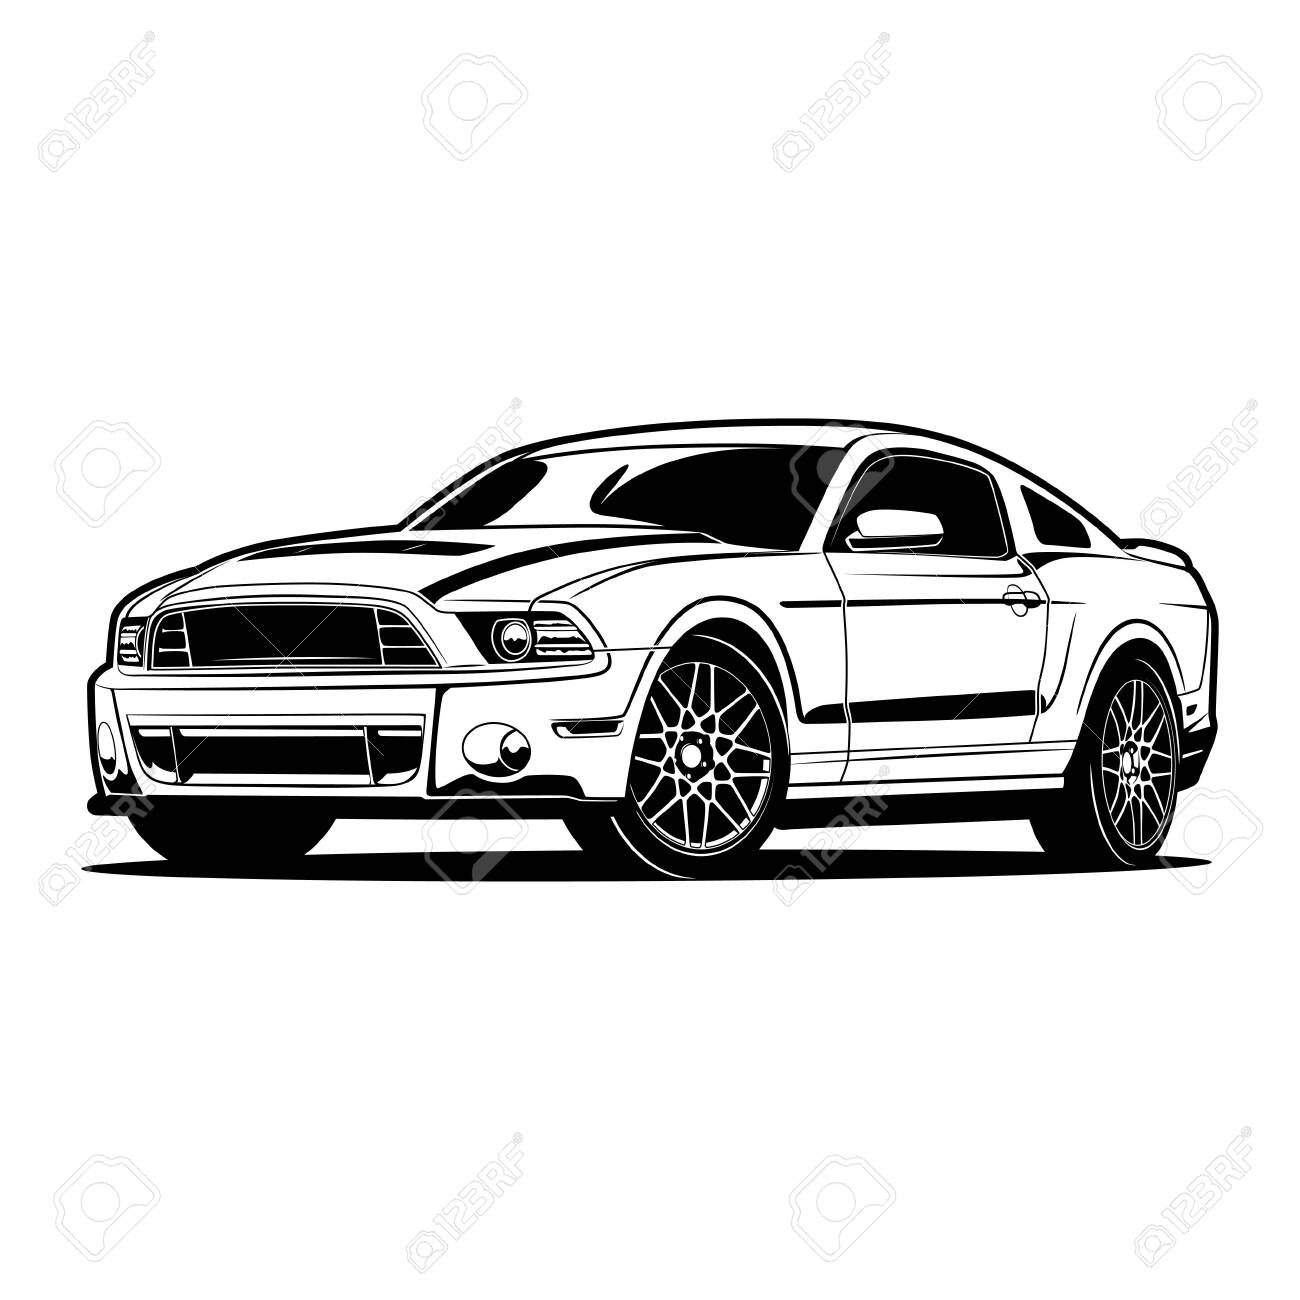 Car vector illustration for conceptual design. - 156952870